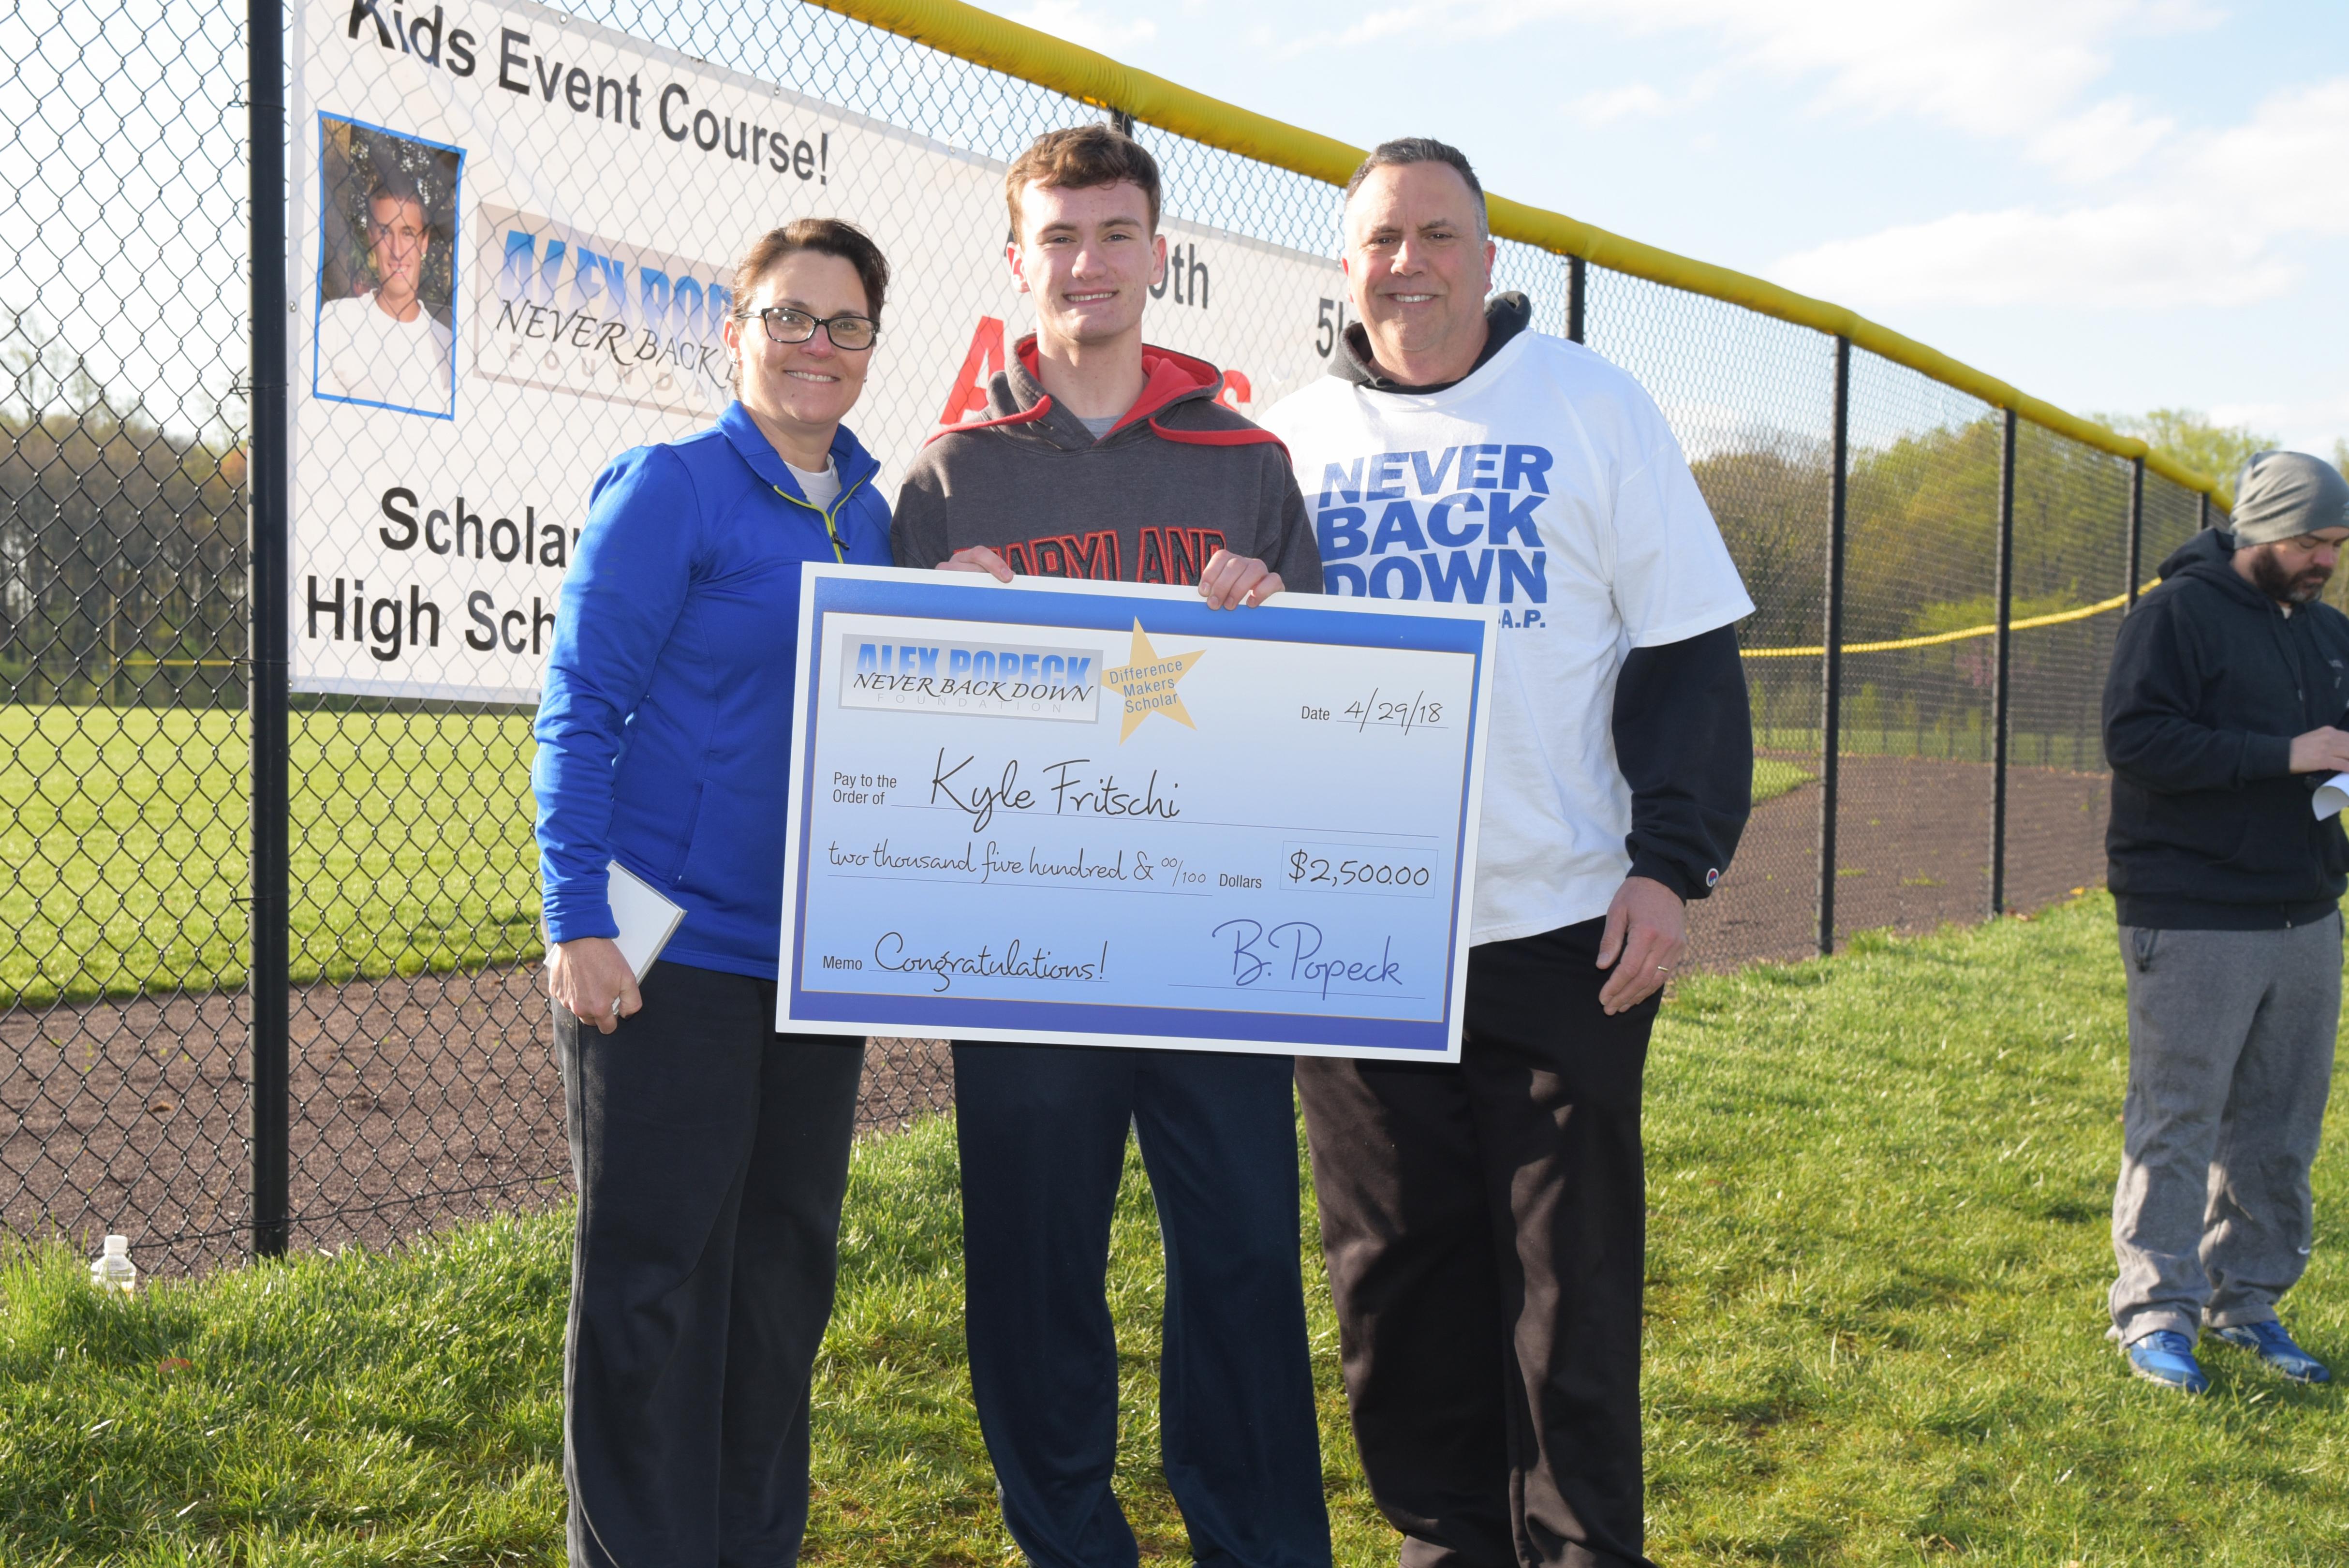 Kyle Fritschi Alex Popeck scholarship winner